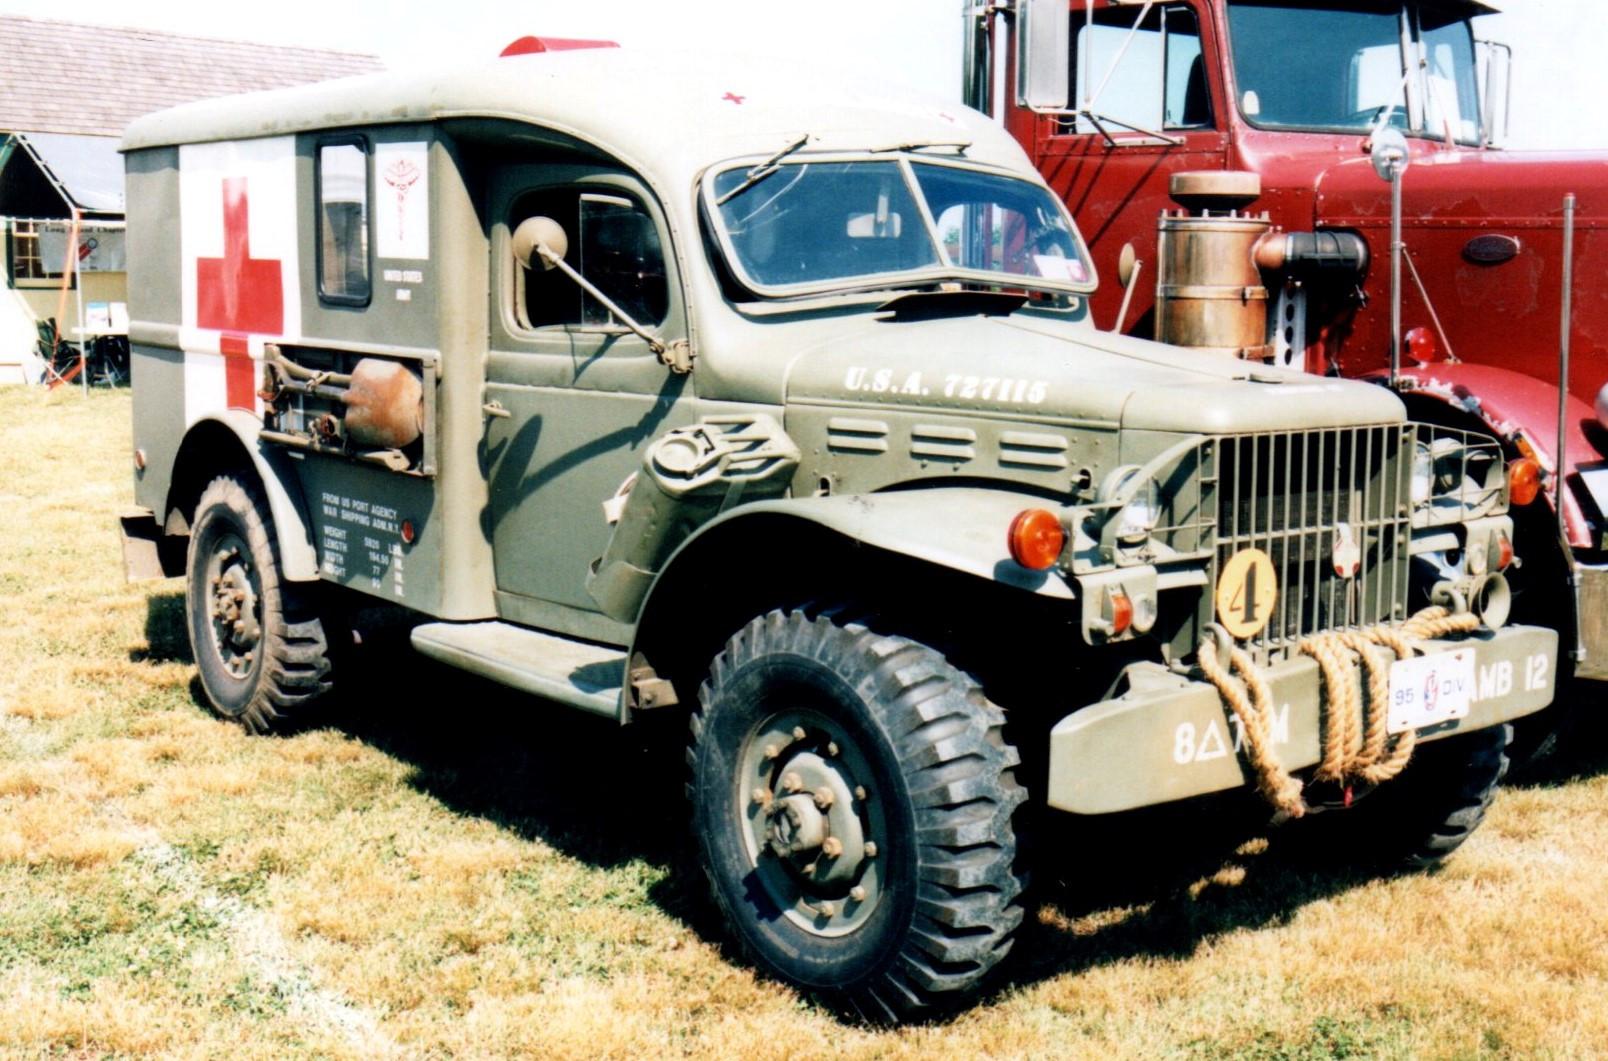 1942 Dodge WC54 Ambulance - Dr. Gary Rosenbaum